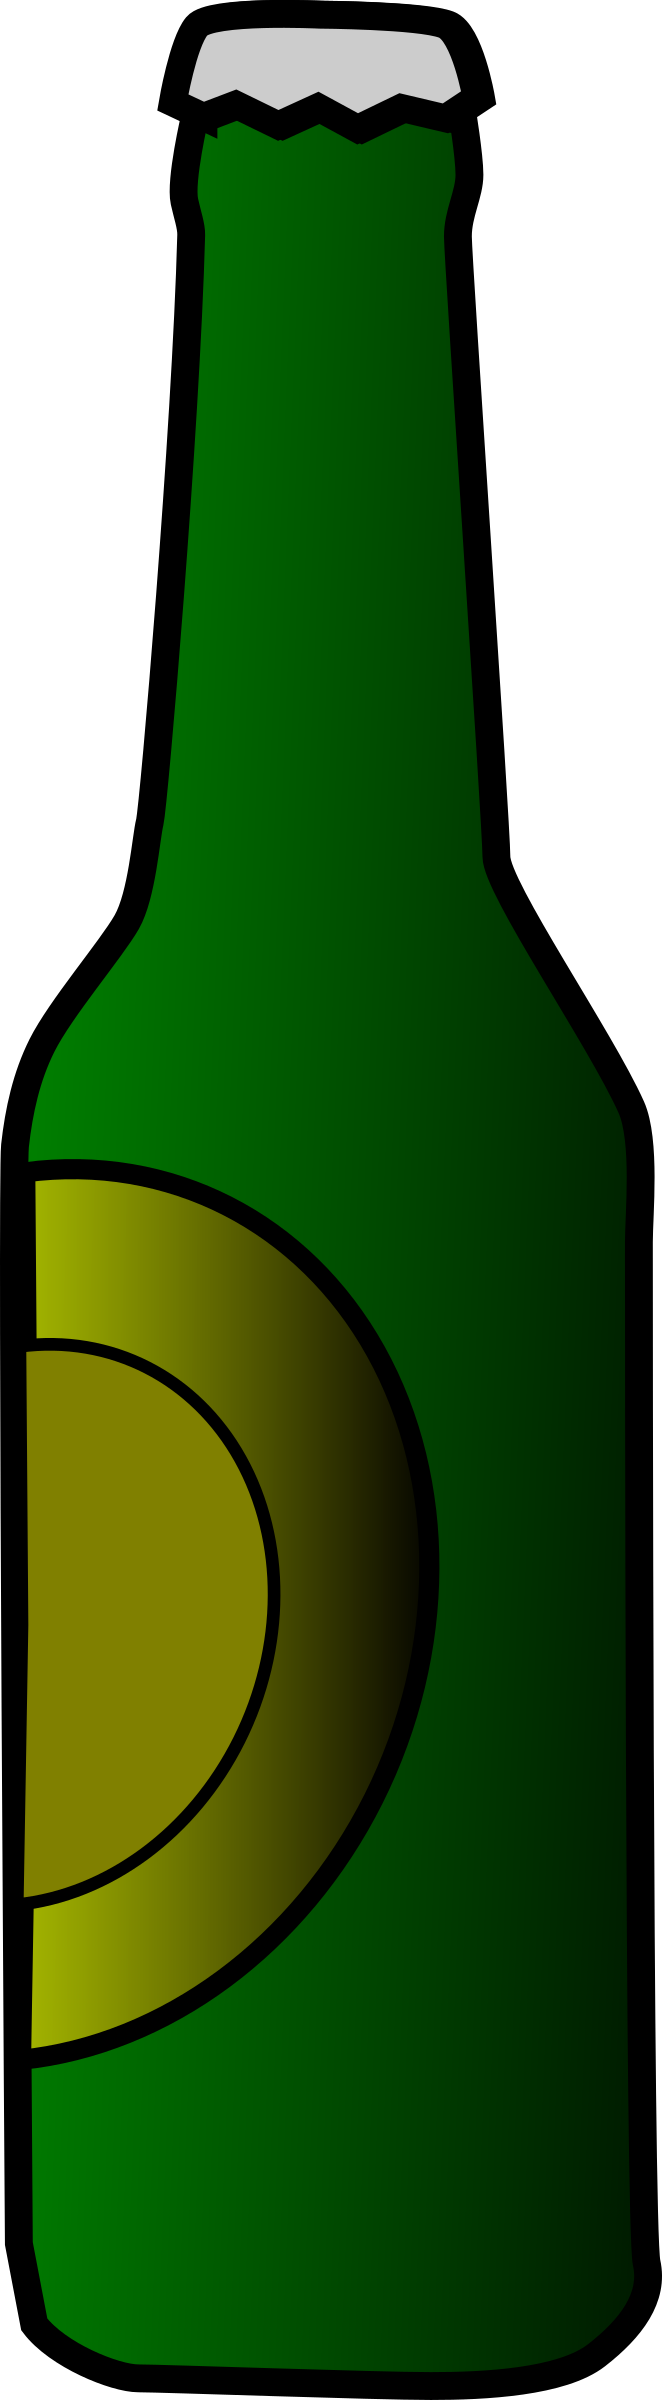 Bottle clipart Clipart 1 NiceClipart bottle Beer